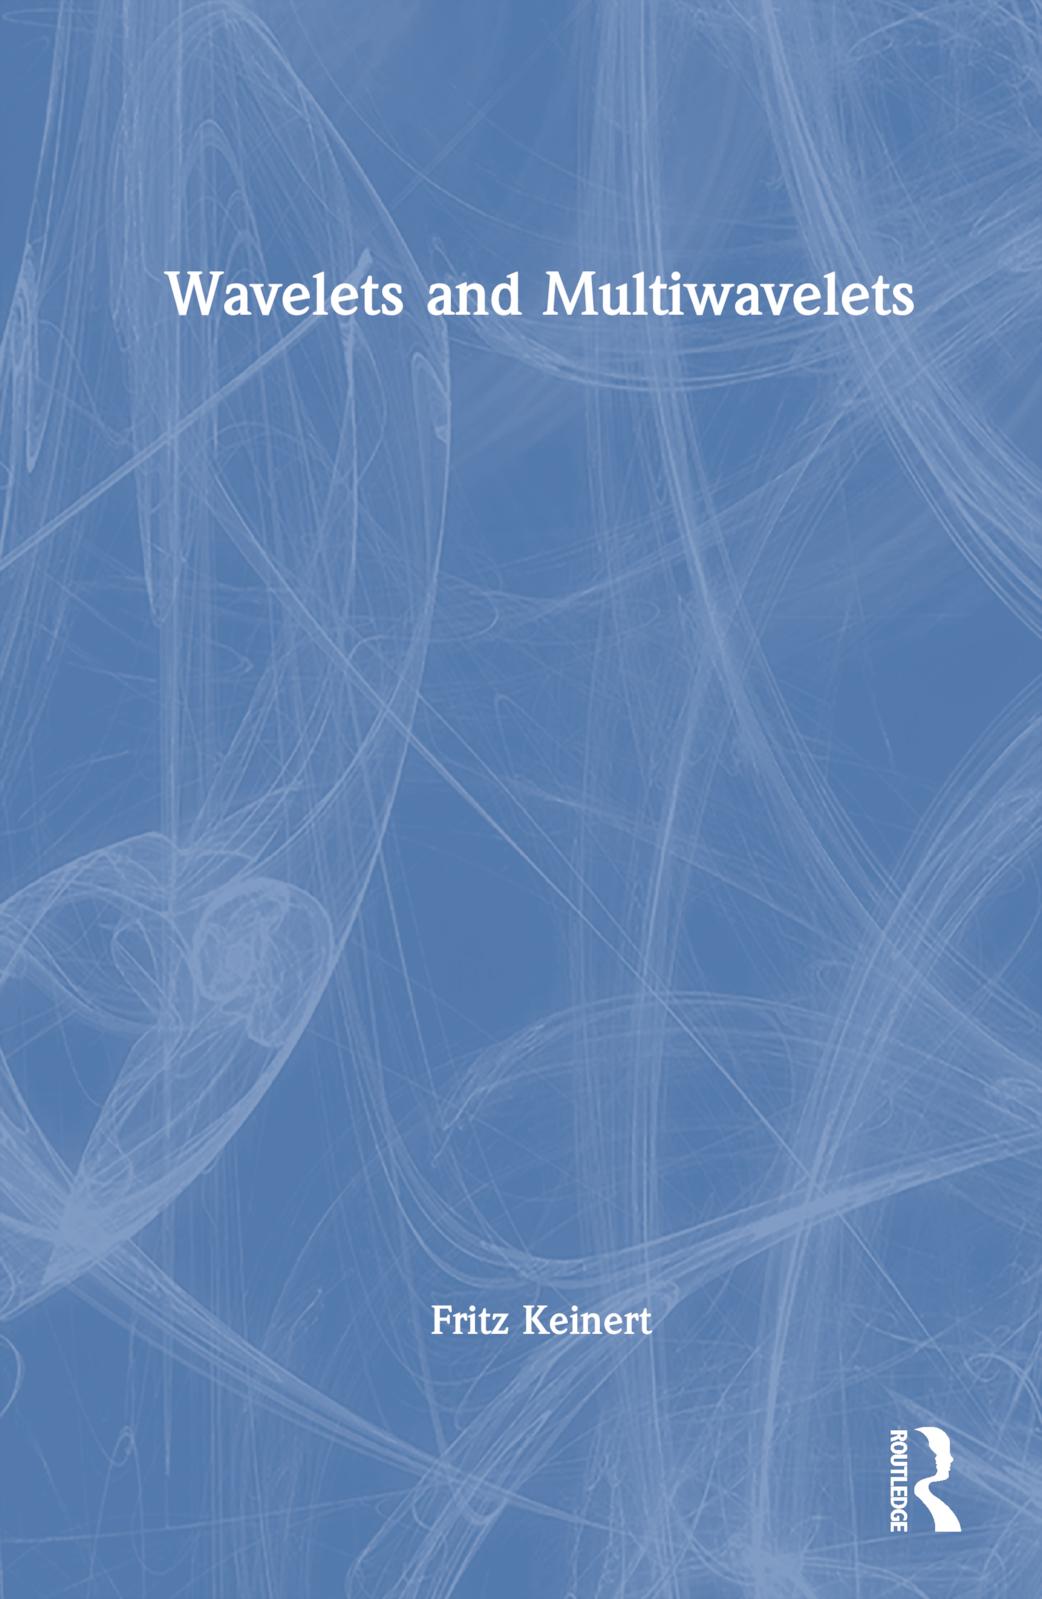 Wavelets and Multiwavelets: 1st Edition (Hardback) book cover